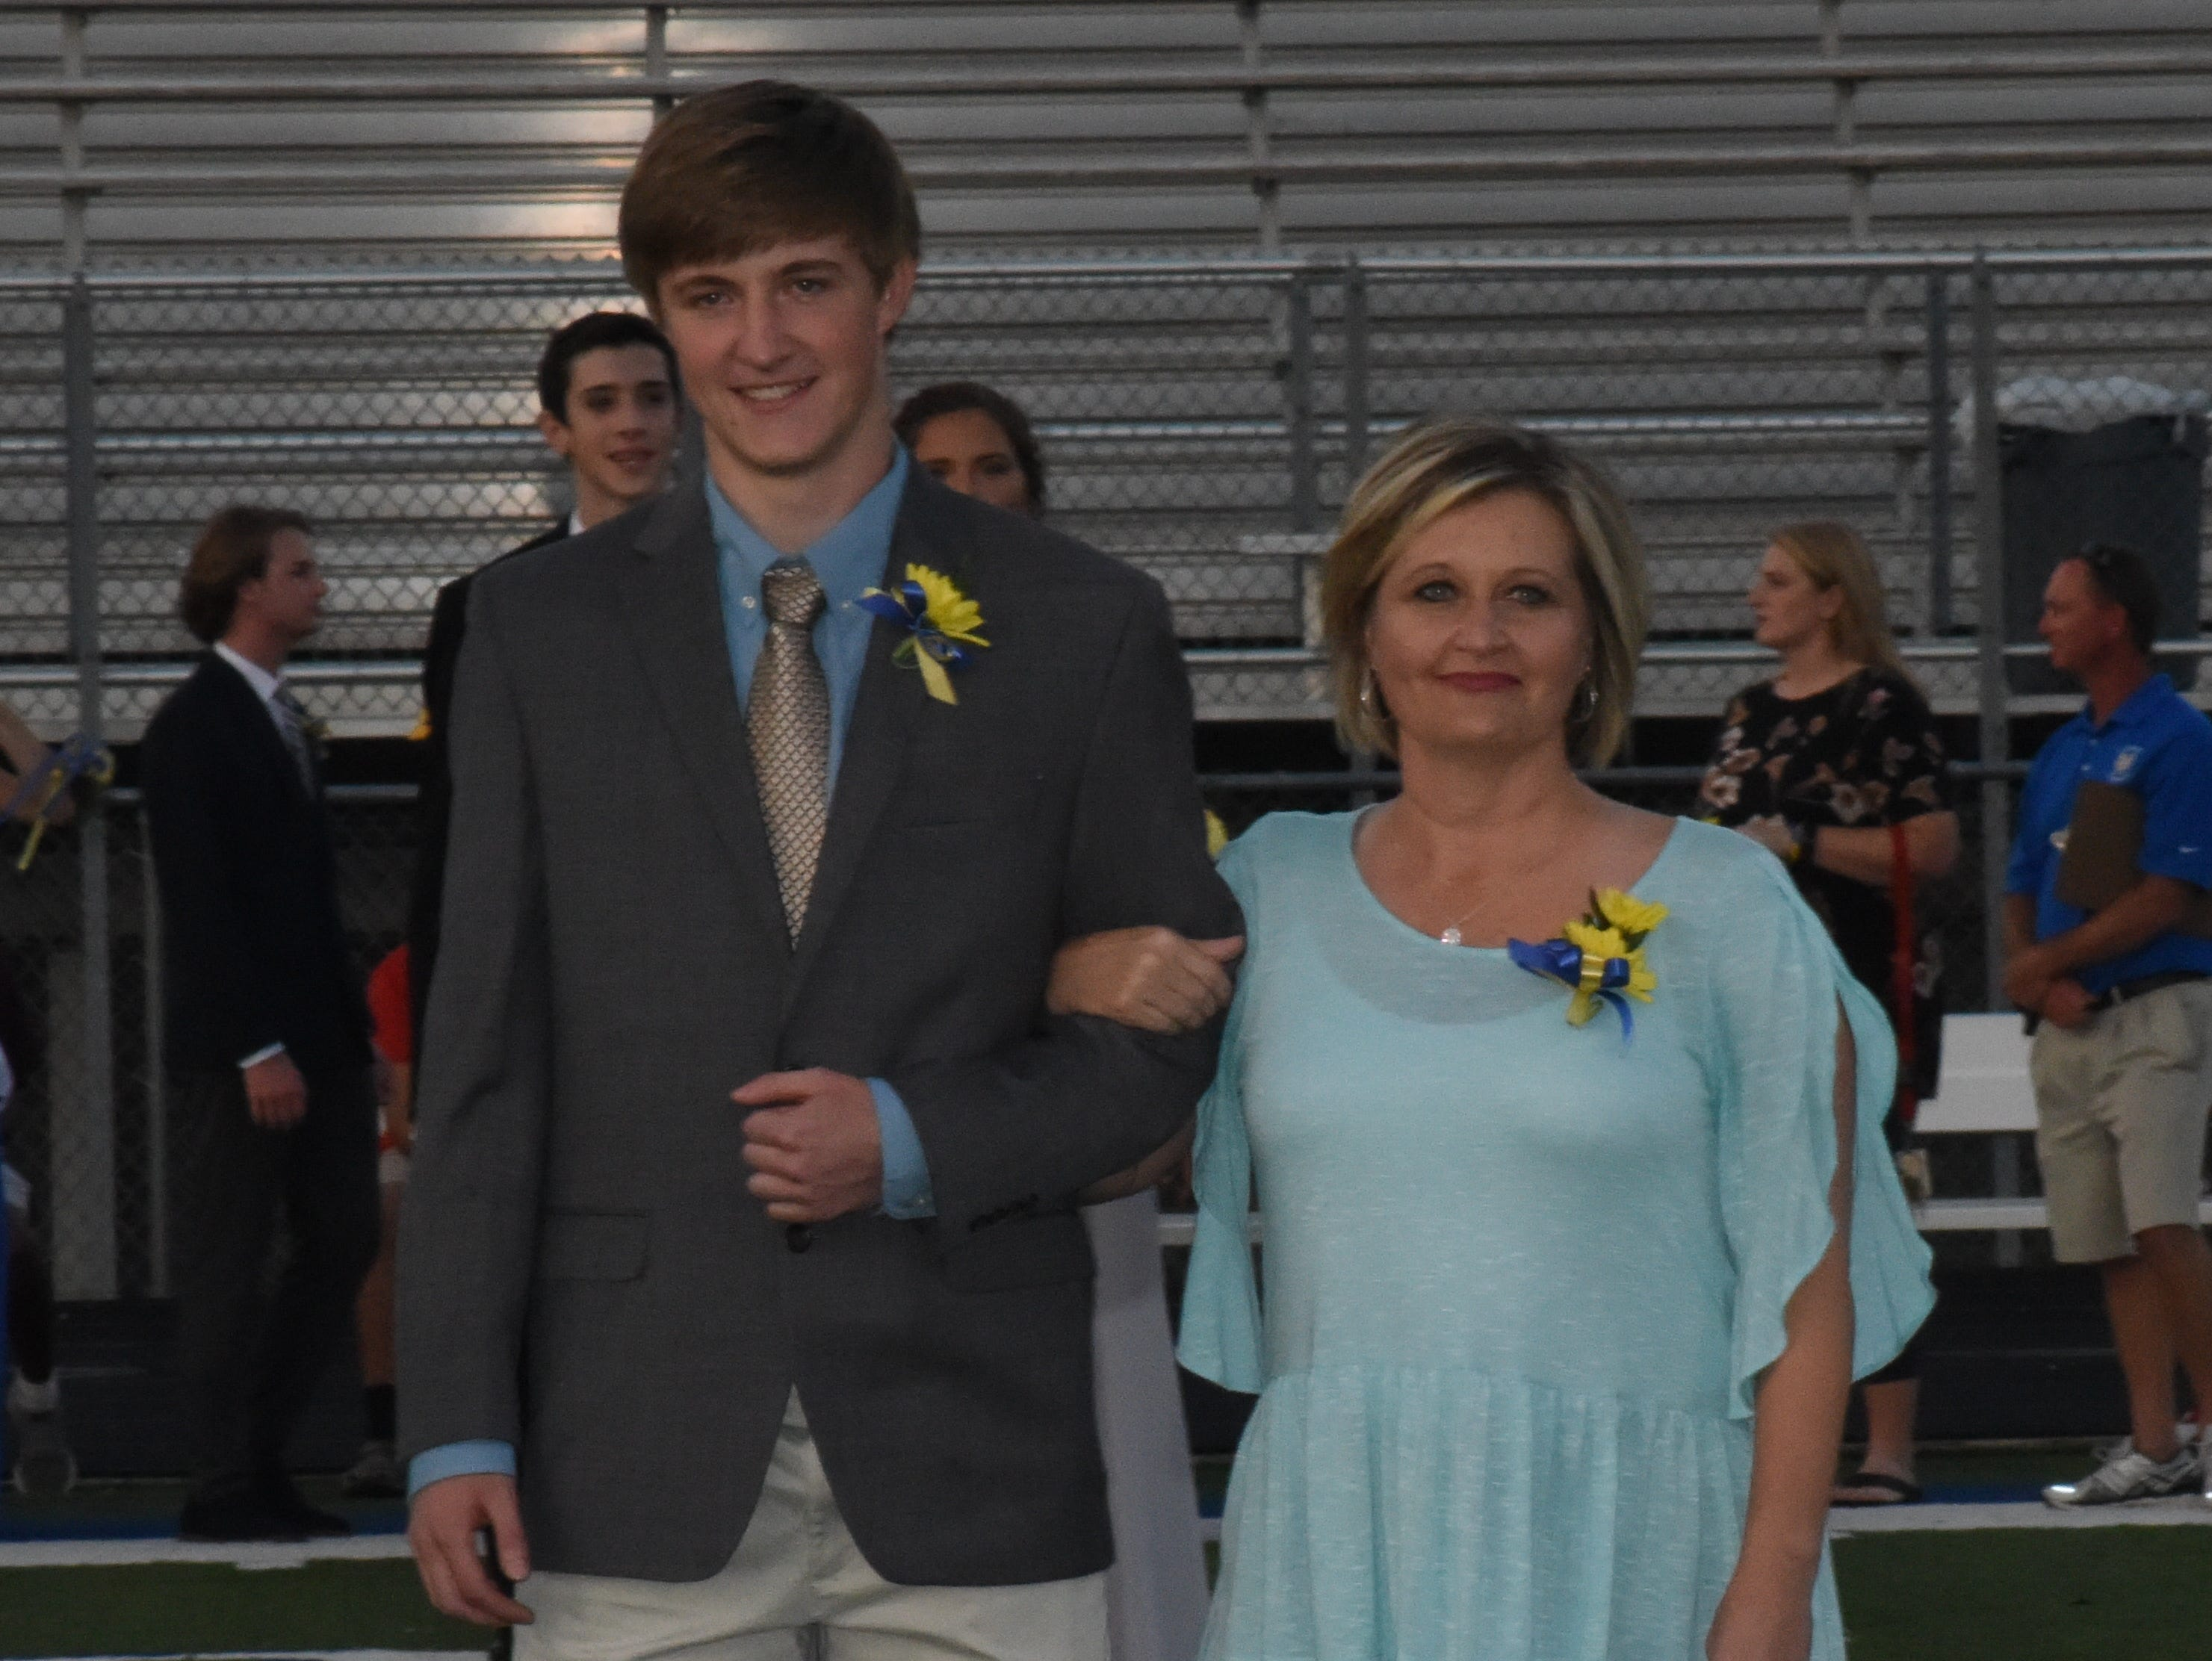 Senior knight Bayler Crecelius and his mother, Kim Crecelius.